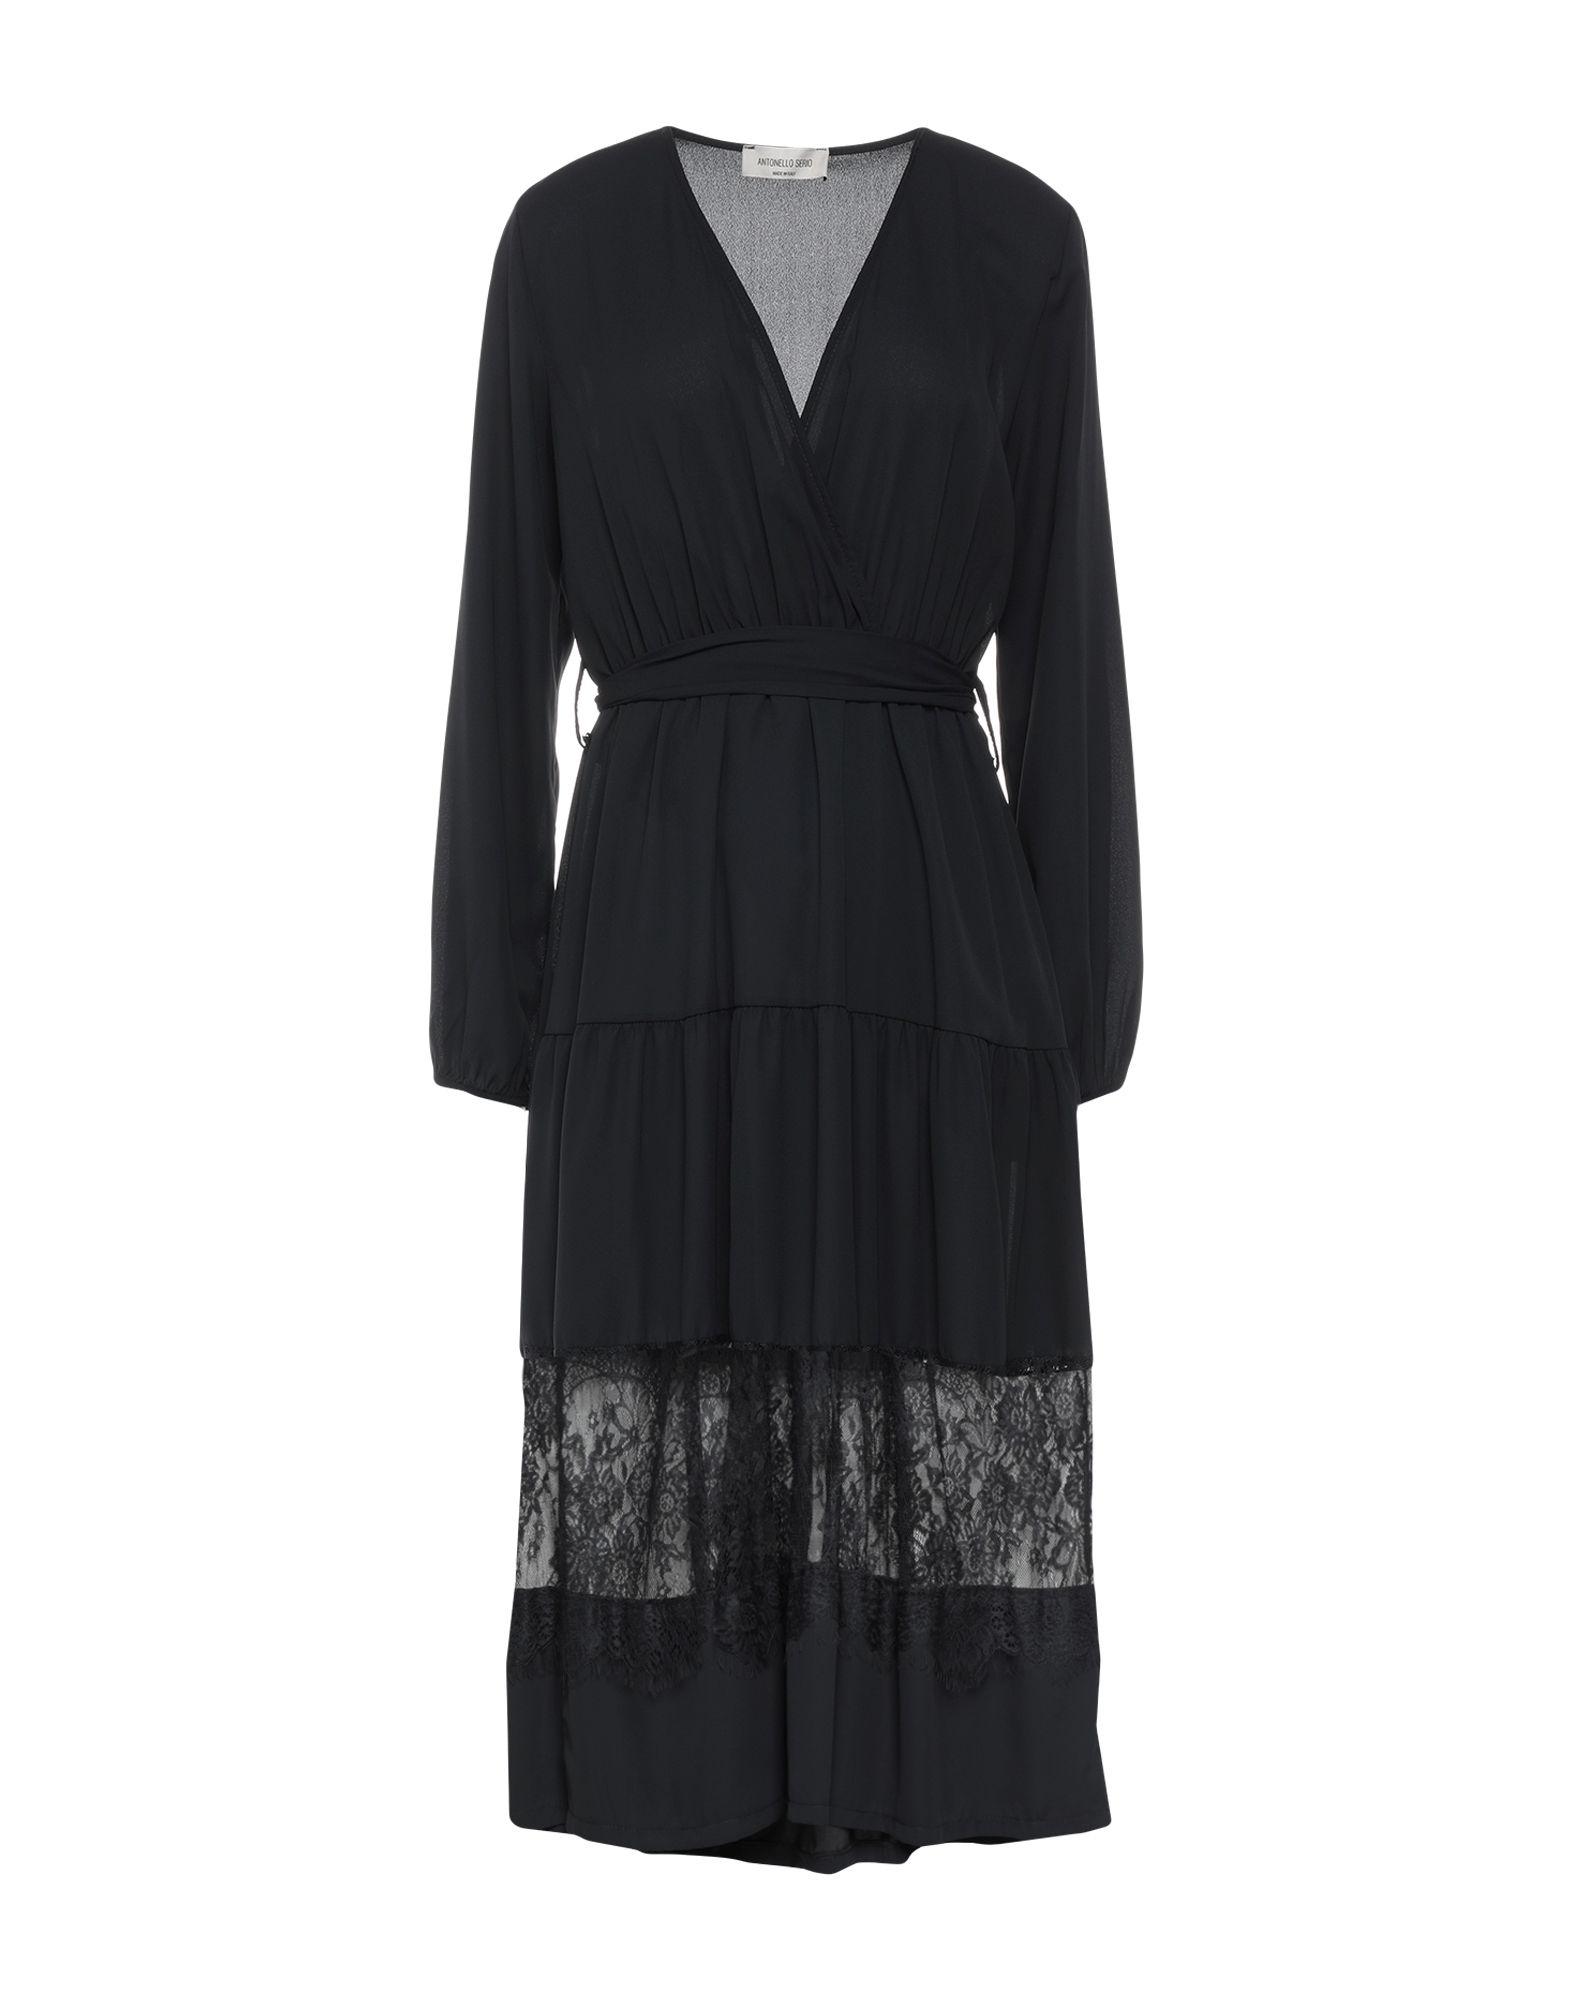 ANTONELLO SERIO Платье длиной 3/4 цены